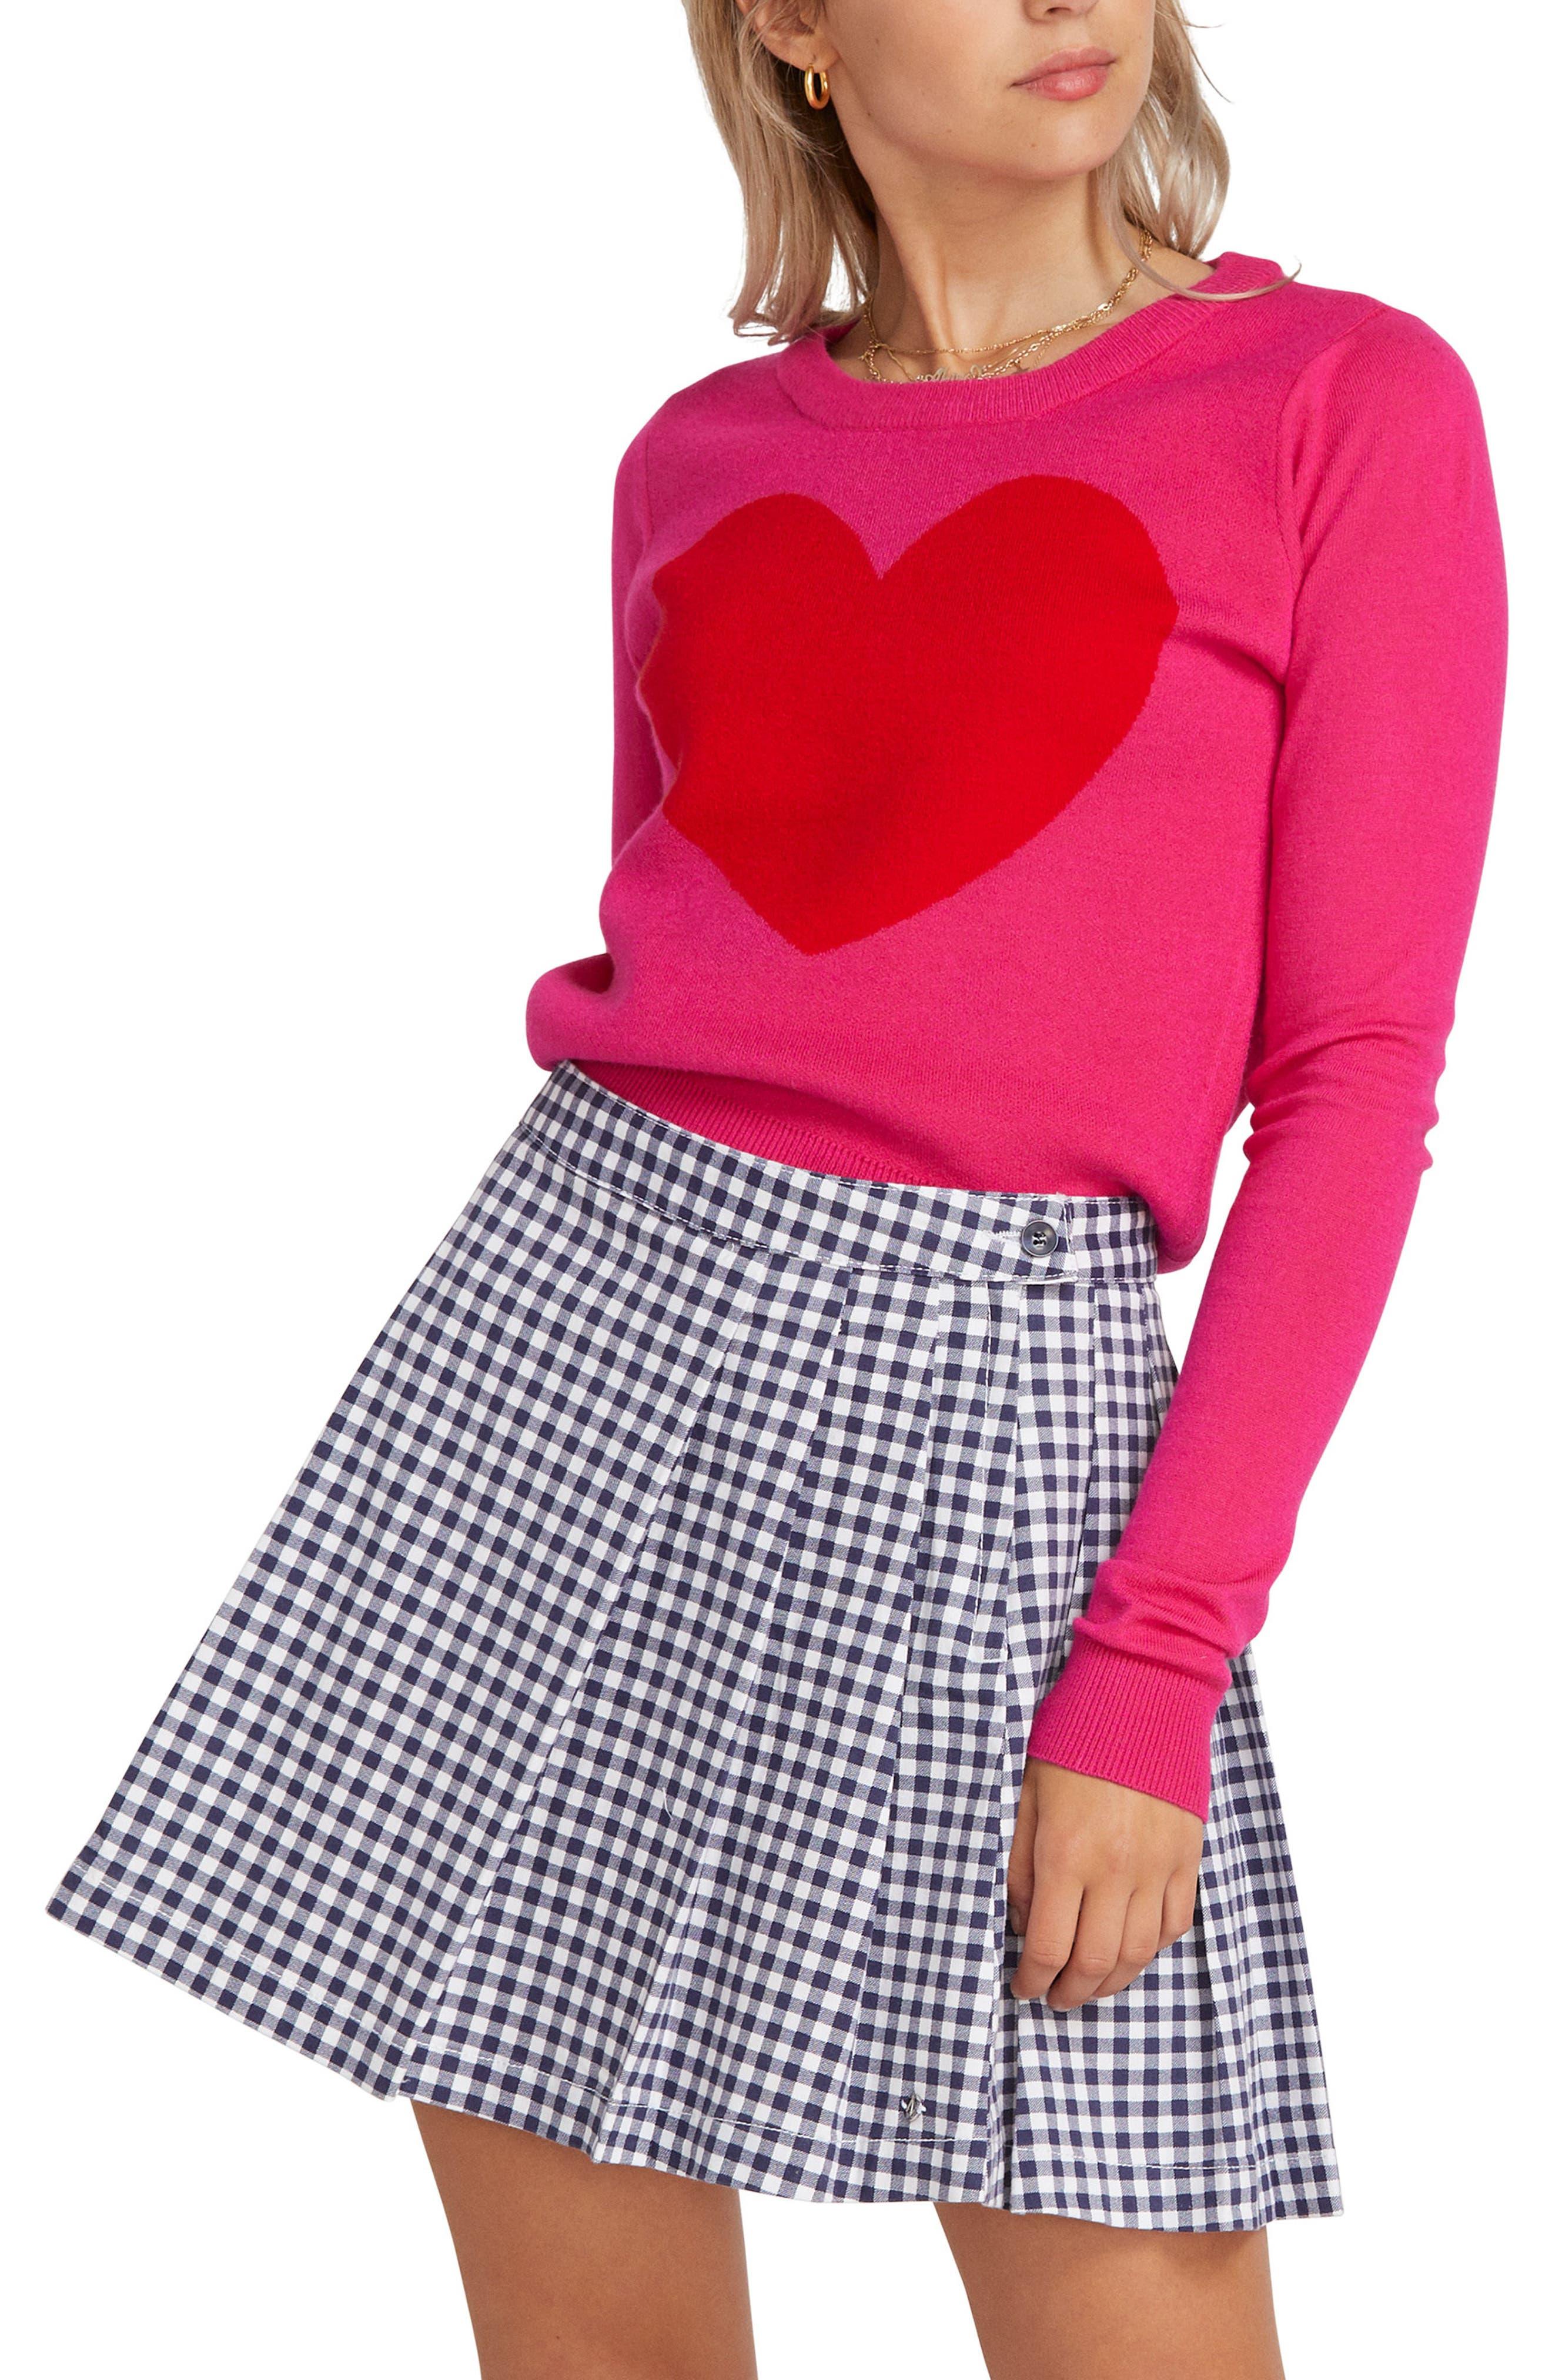 Volcom X Georgia May Jagger Heart Sweater, Pink